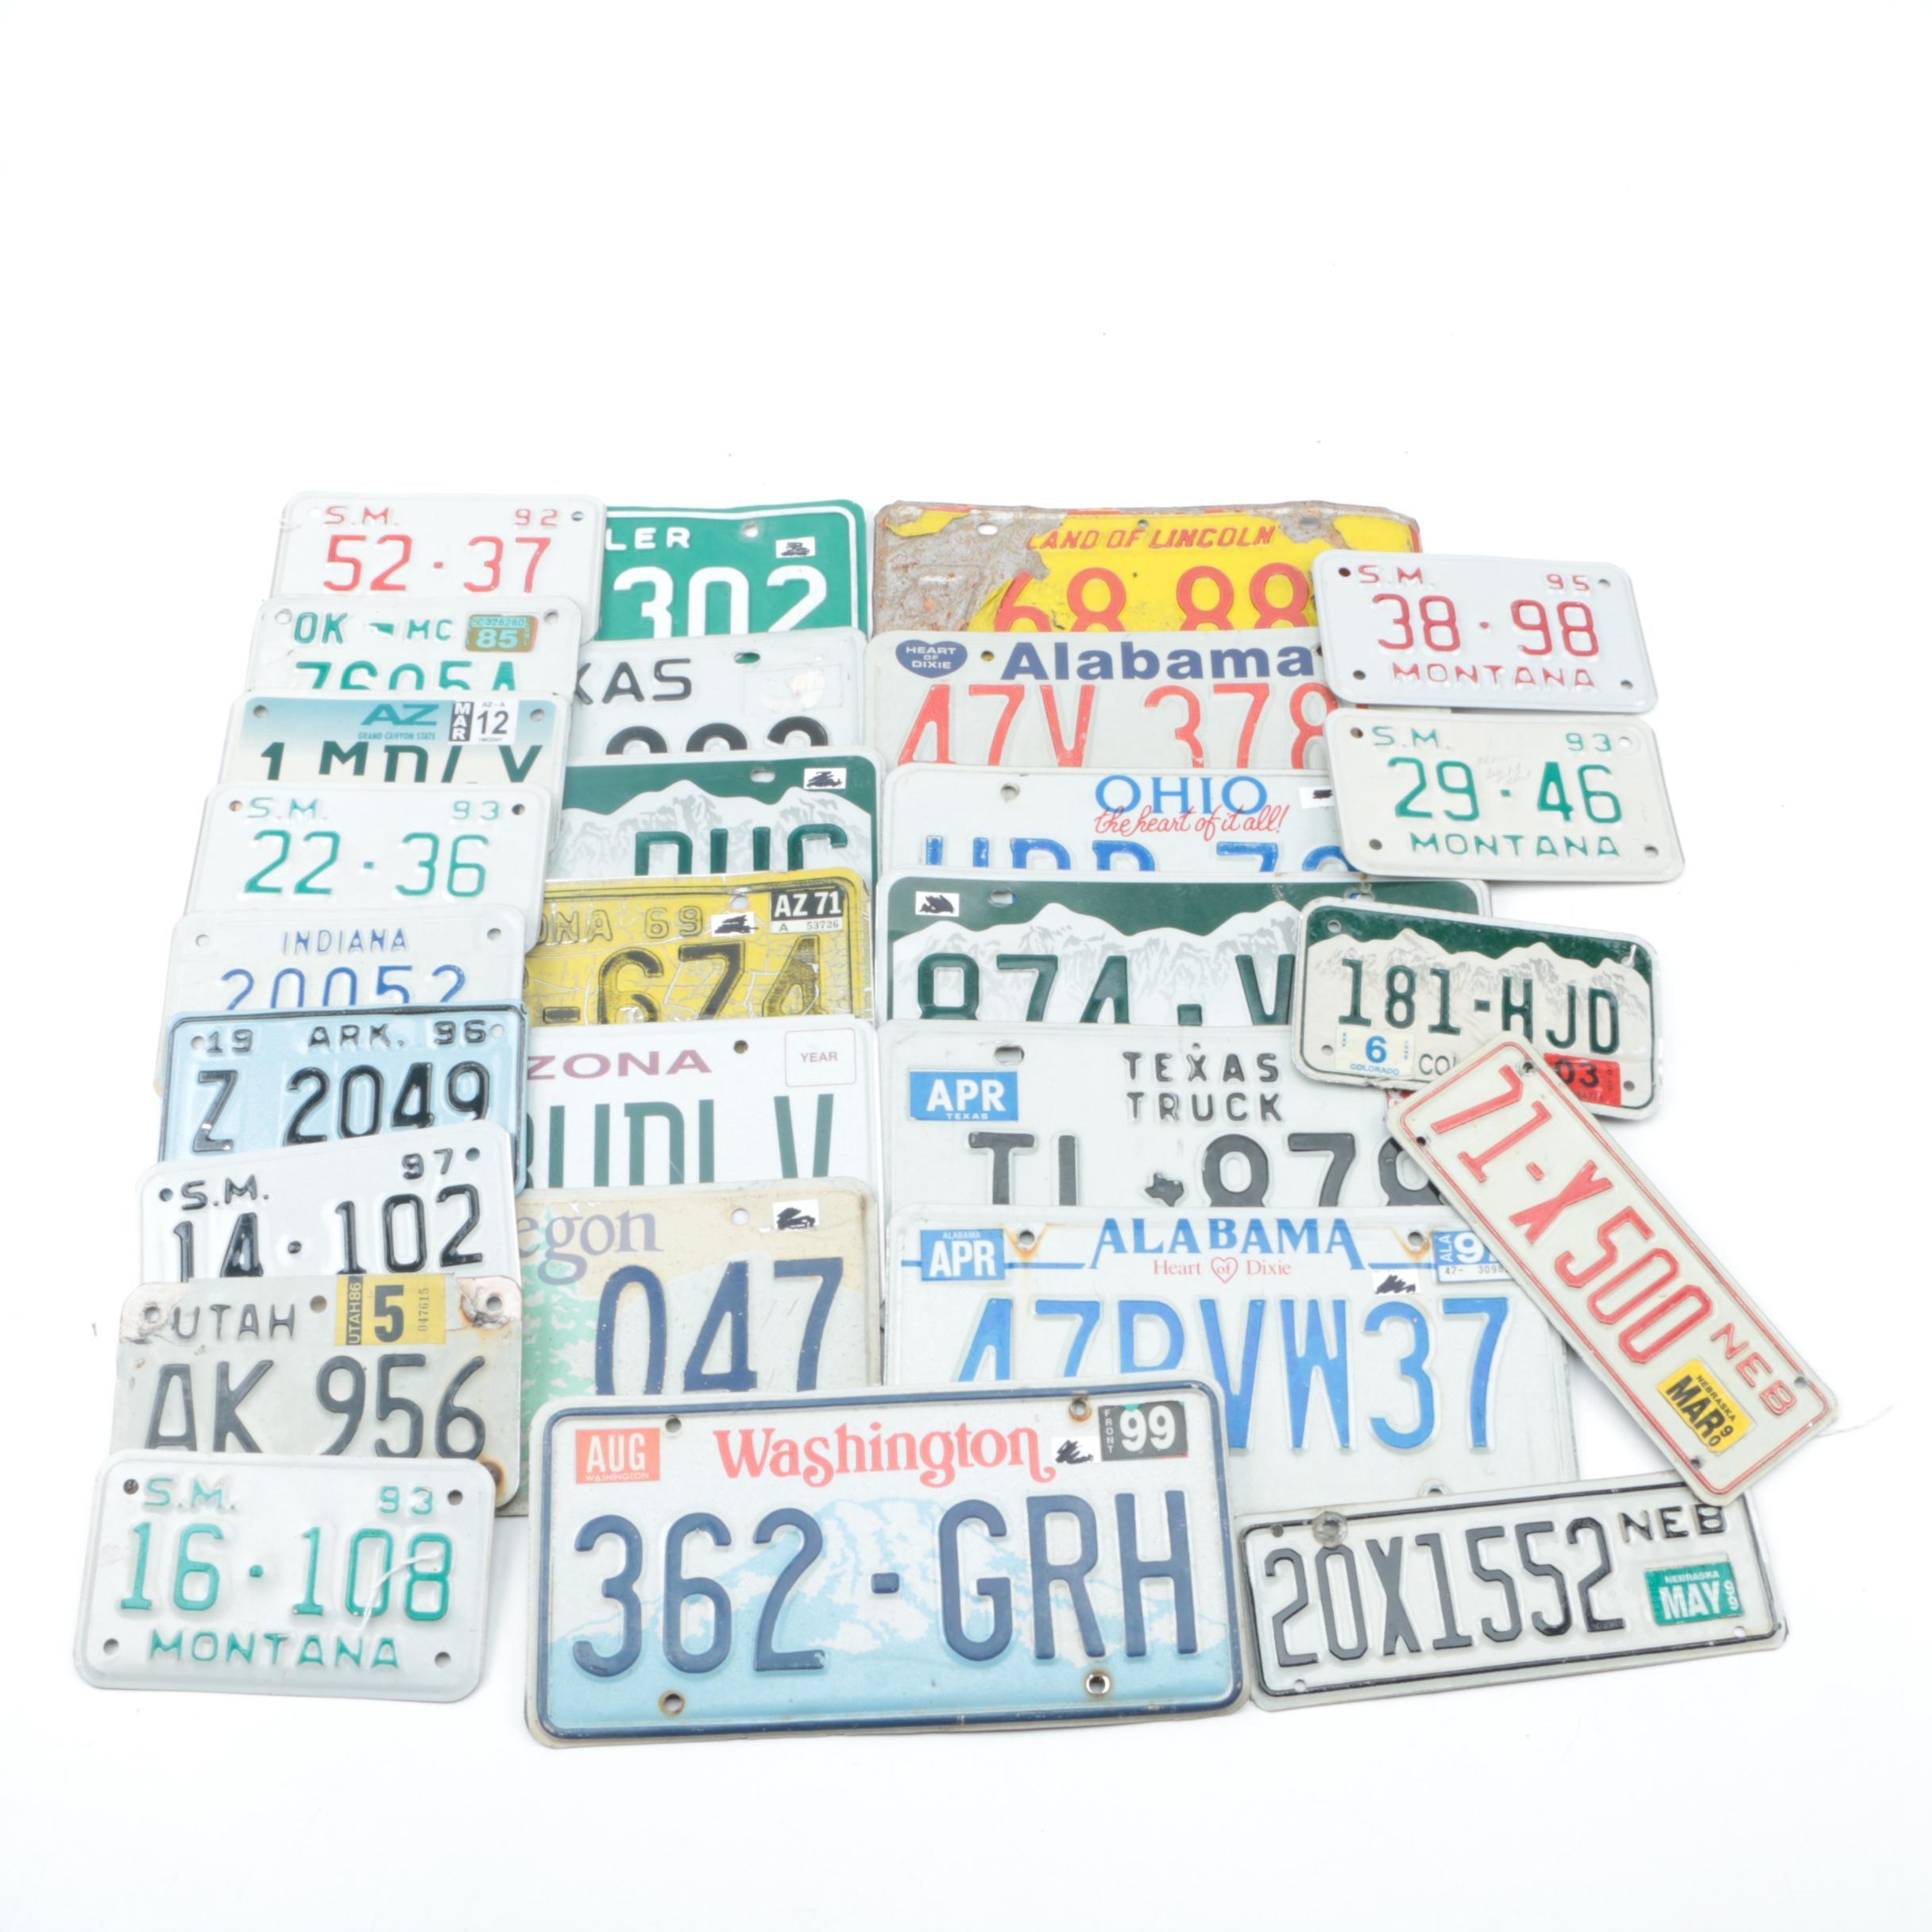 License Plates From Arizona, Montana, Colorado, Ohio and More